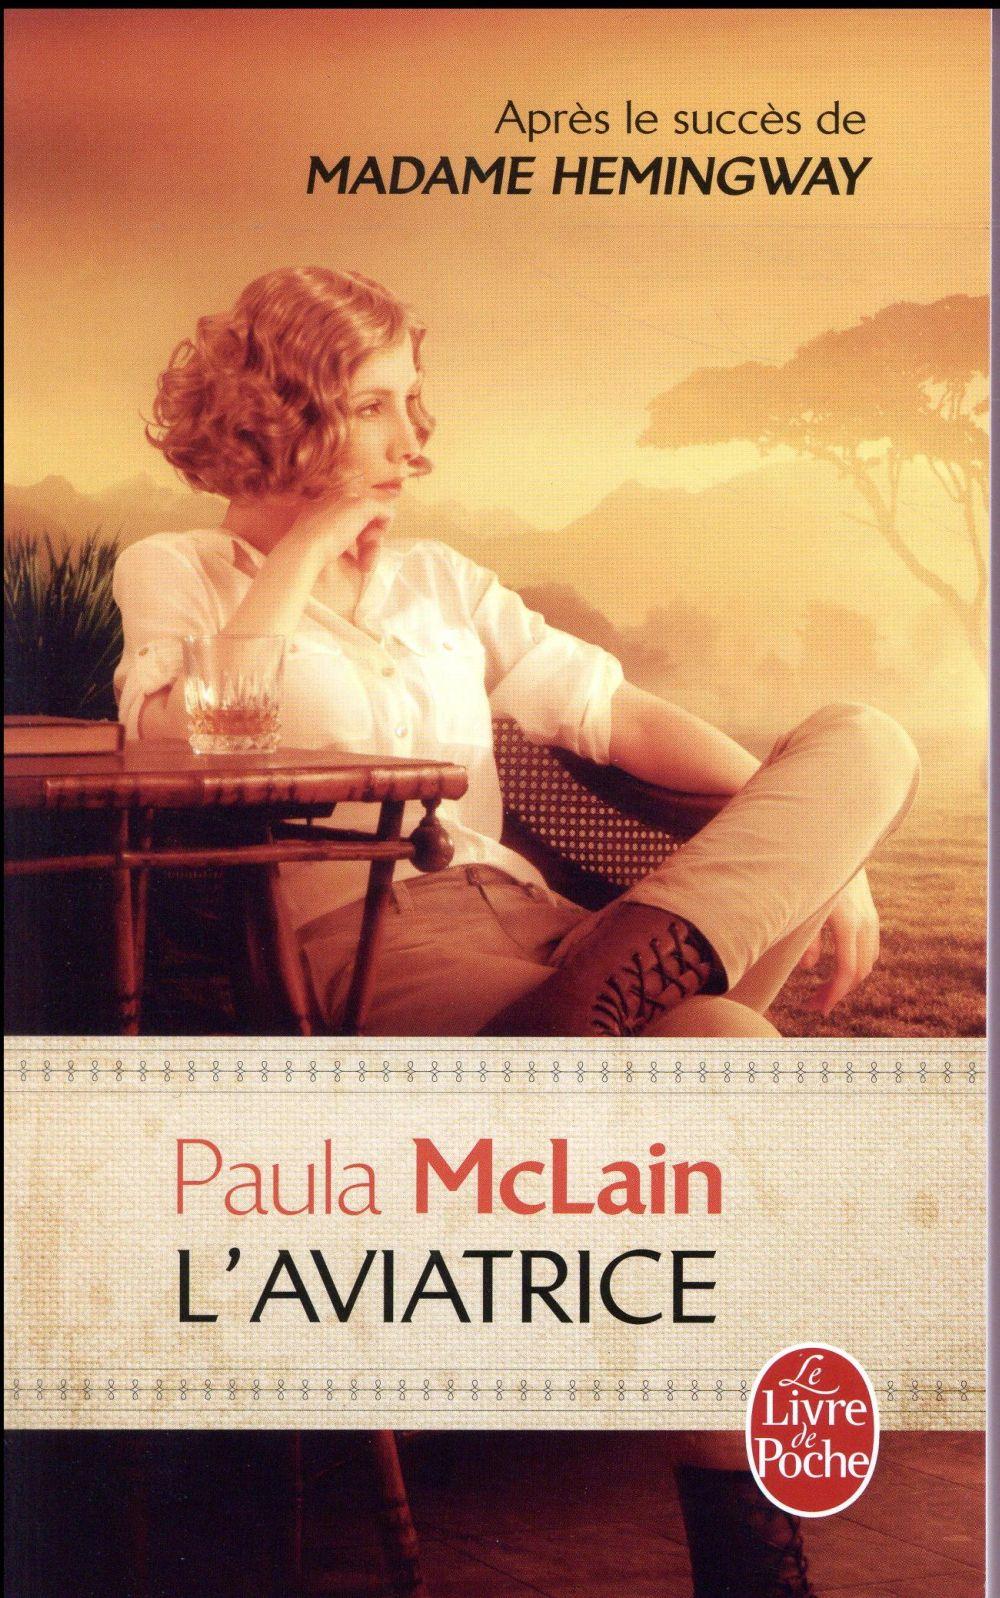 MCLAIN-P - L'AVIATRICE